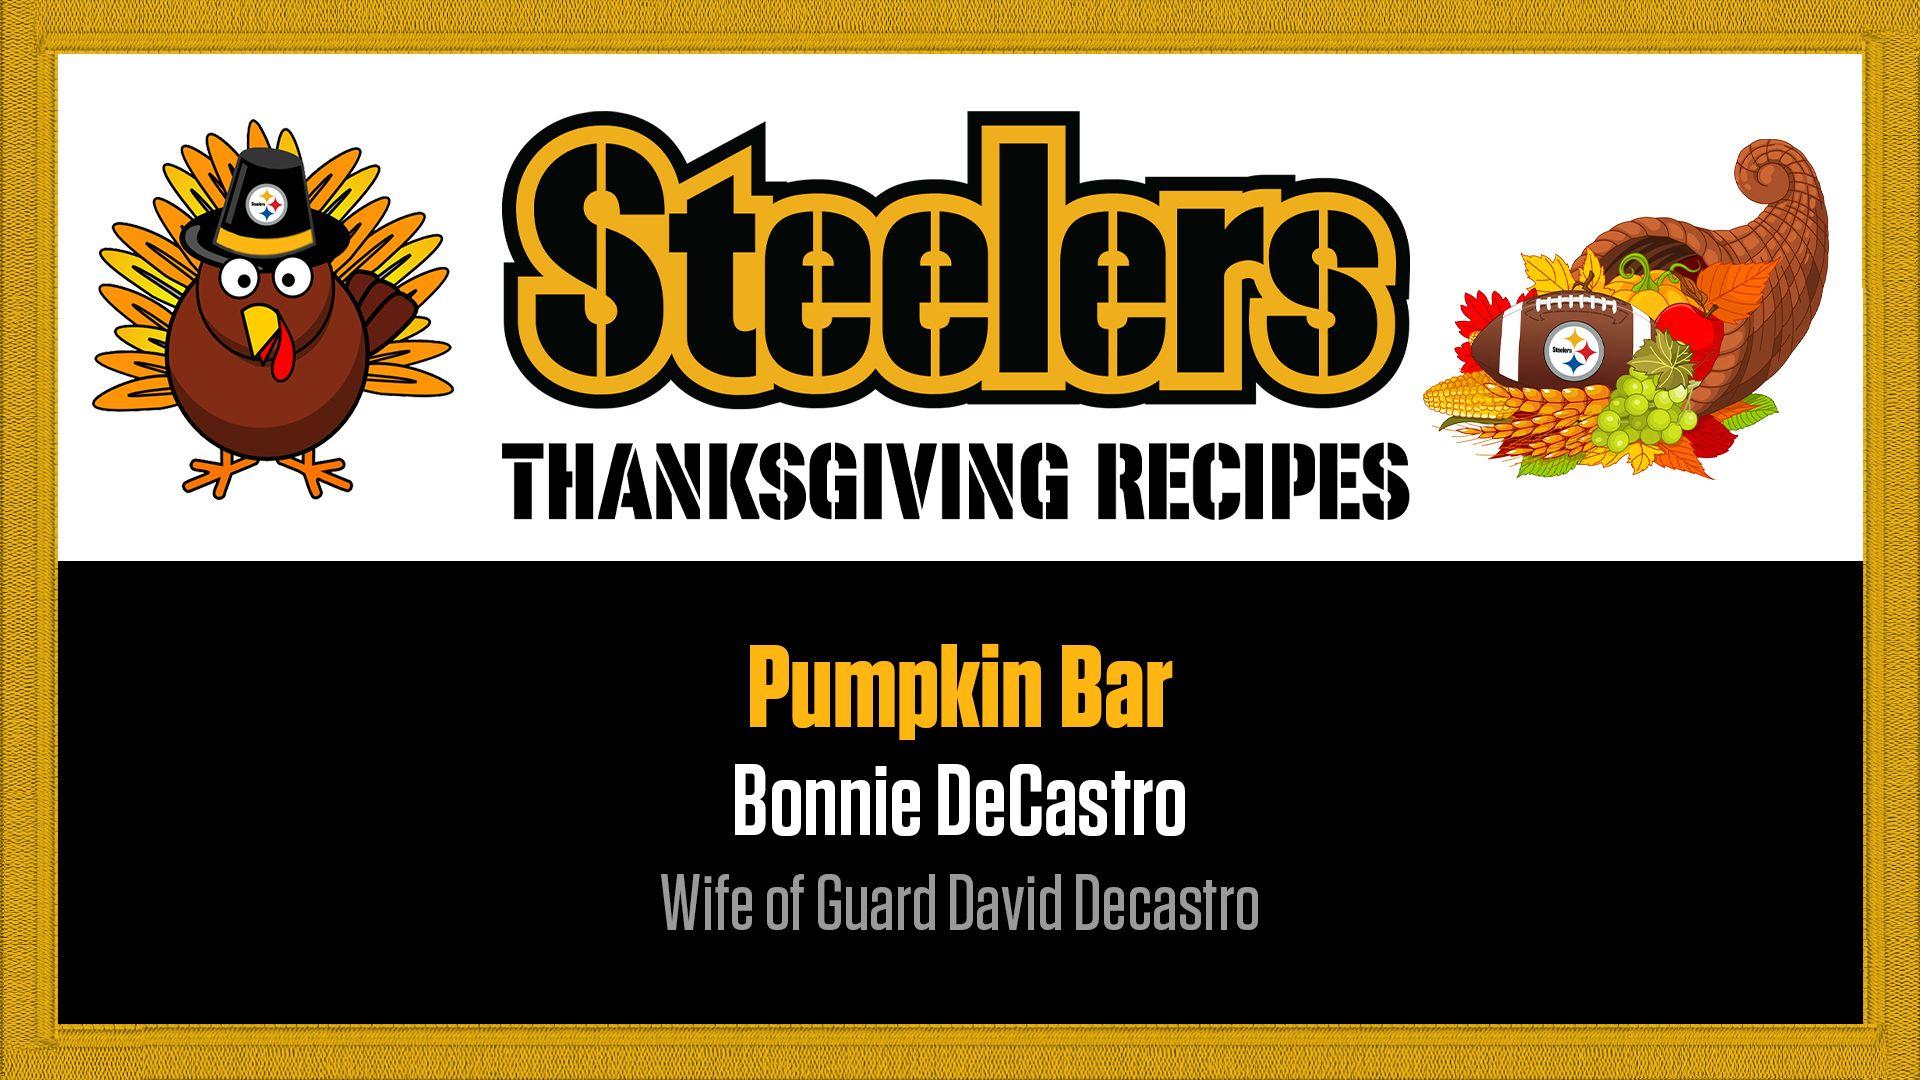 pumpkin bar_bonnie decastro